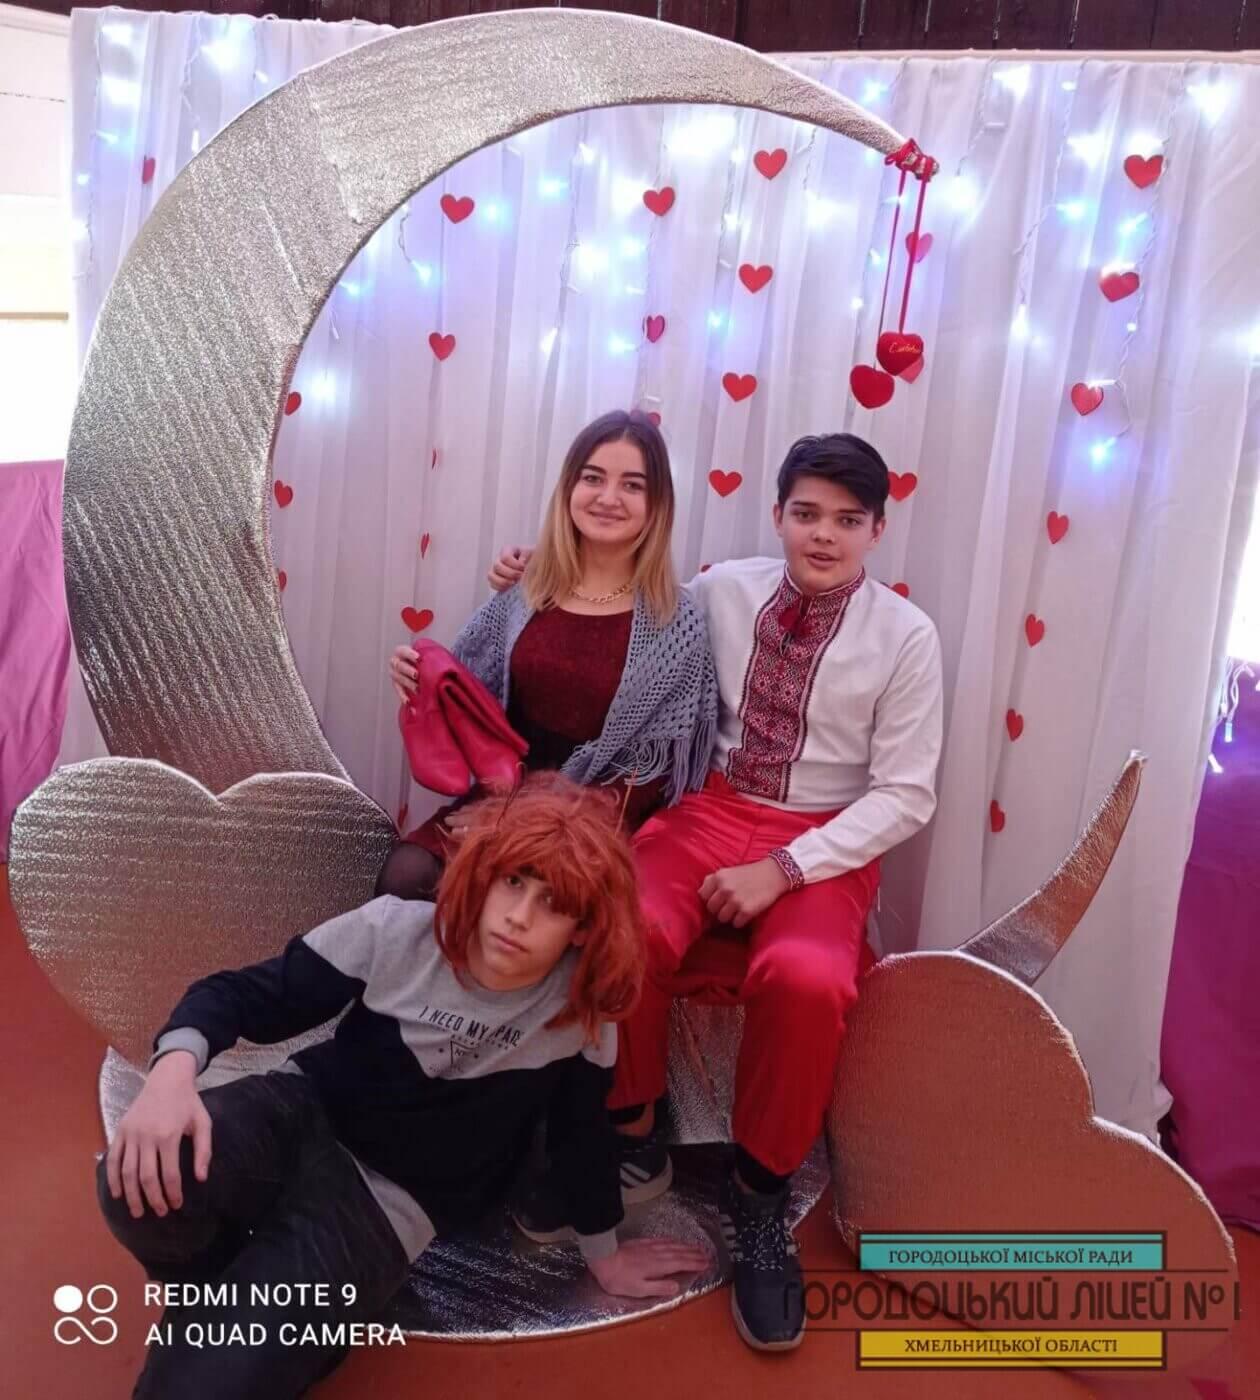 zobrazhennya viber 2021 02 14 00 04 10 1260x1400 - Вір у велику силу кохання!